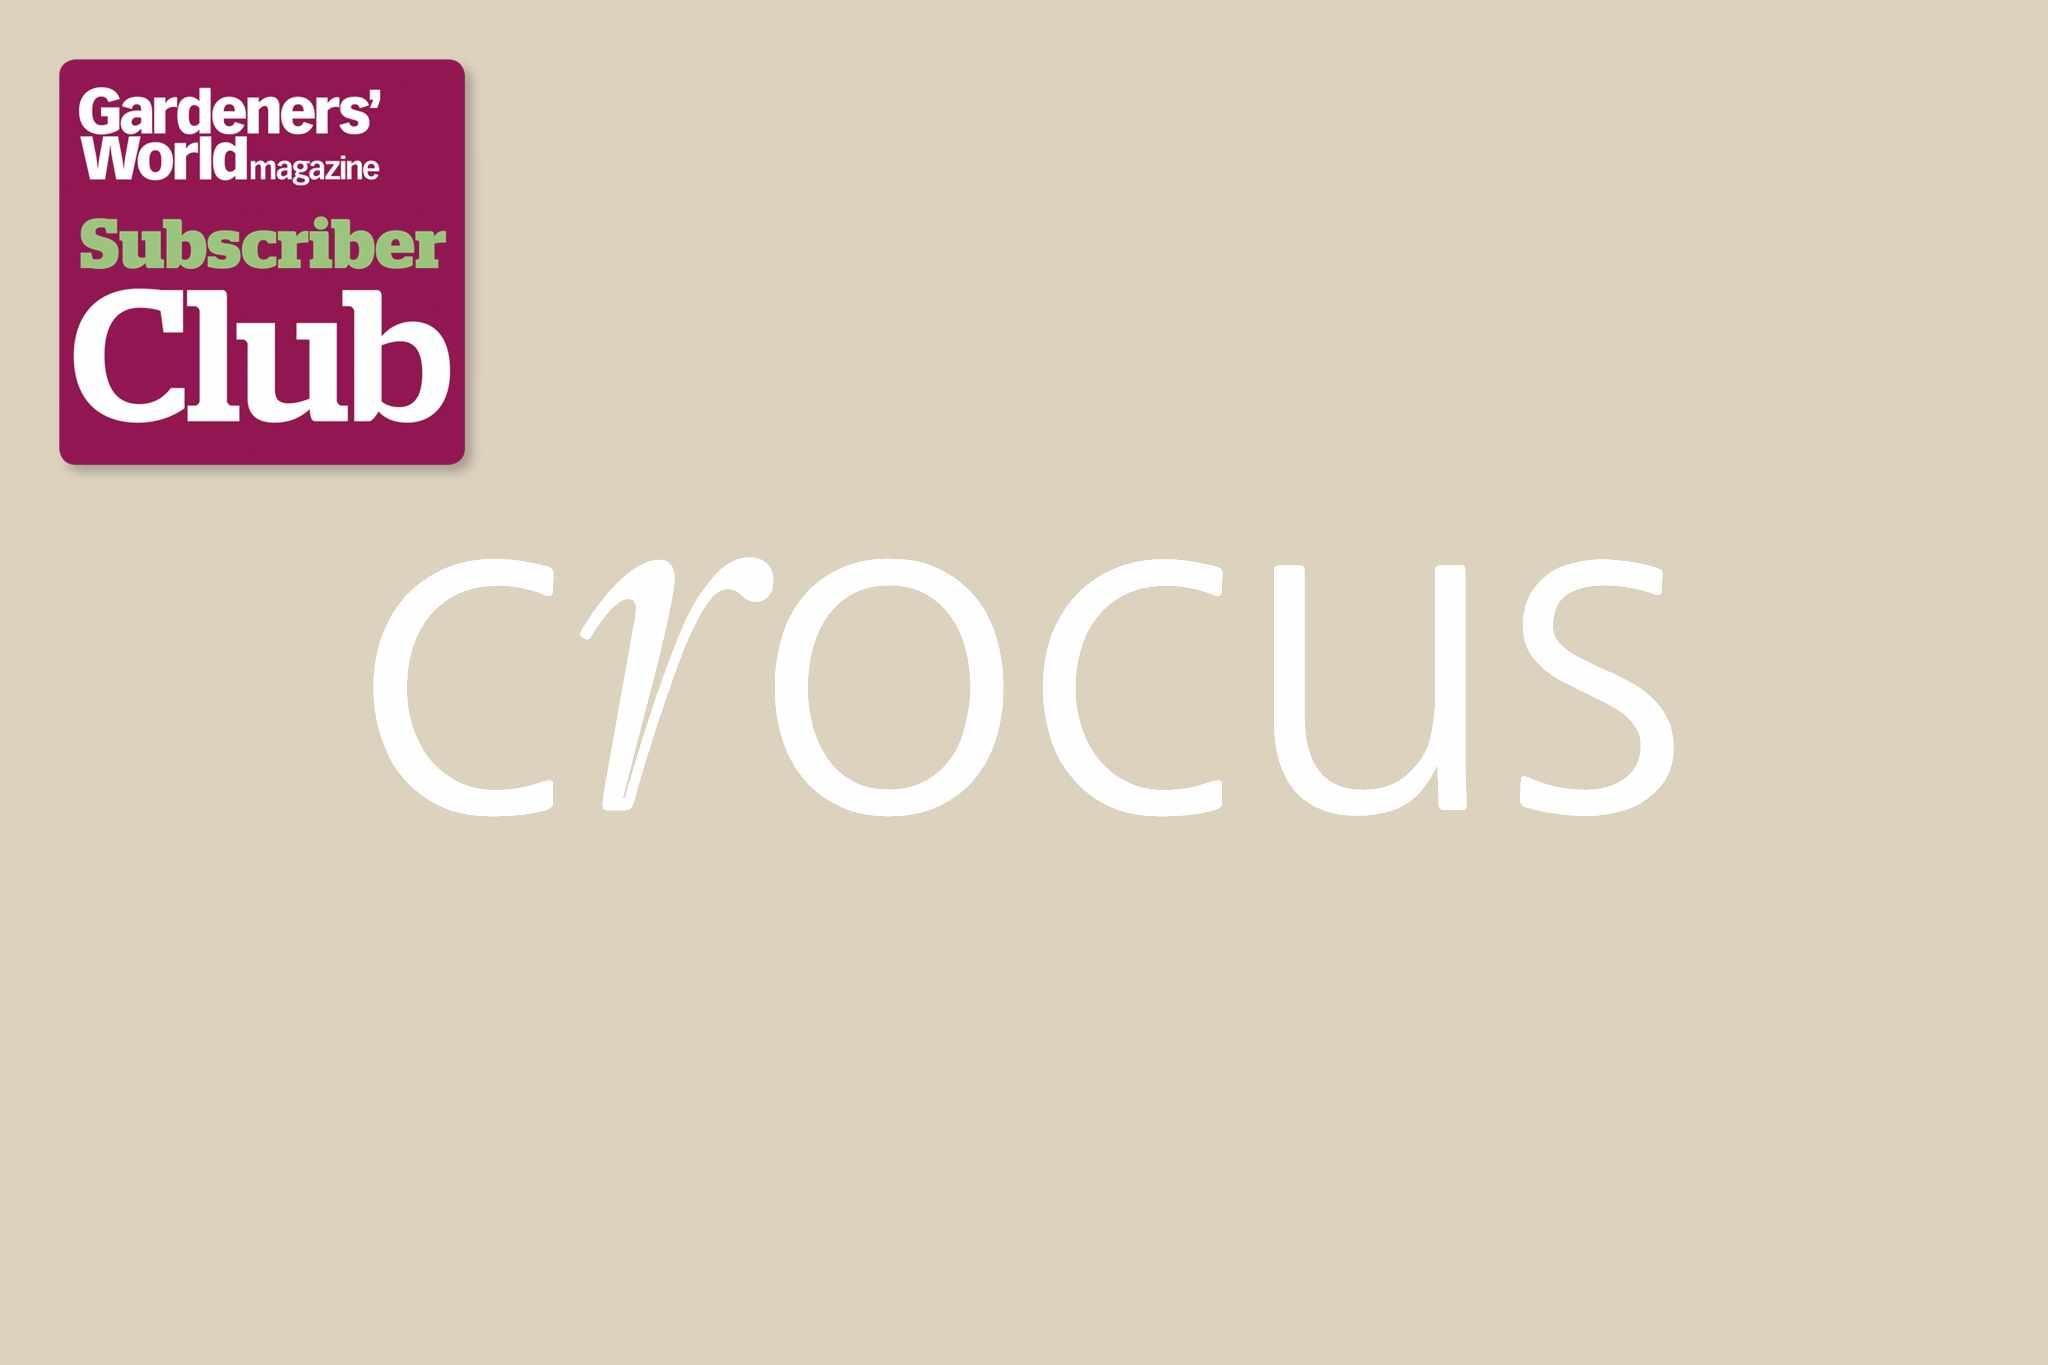 Crocus BBC Gardeners' World Magazine Subscriber Club discount